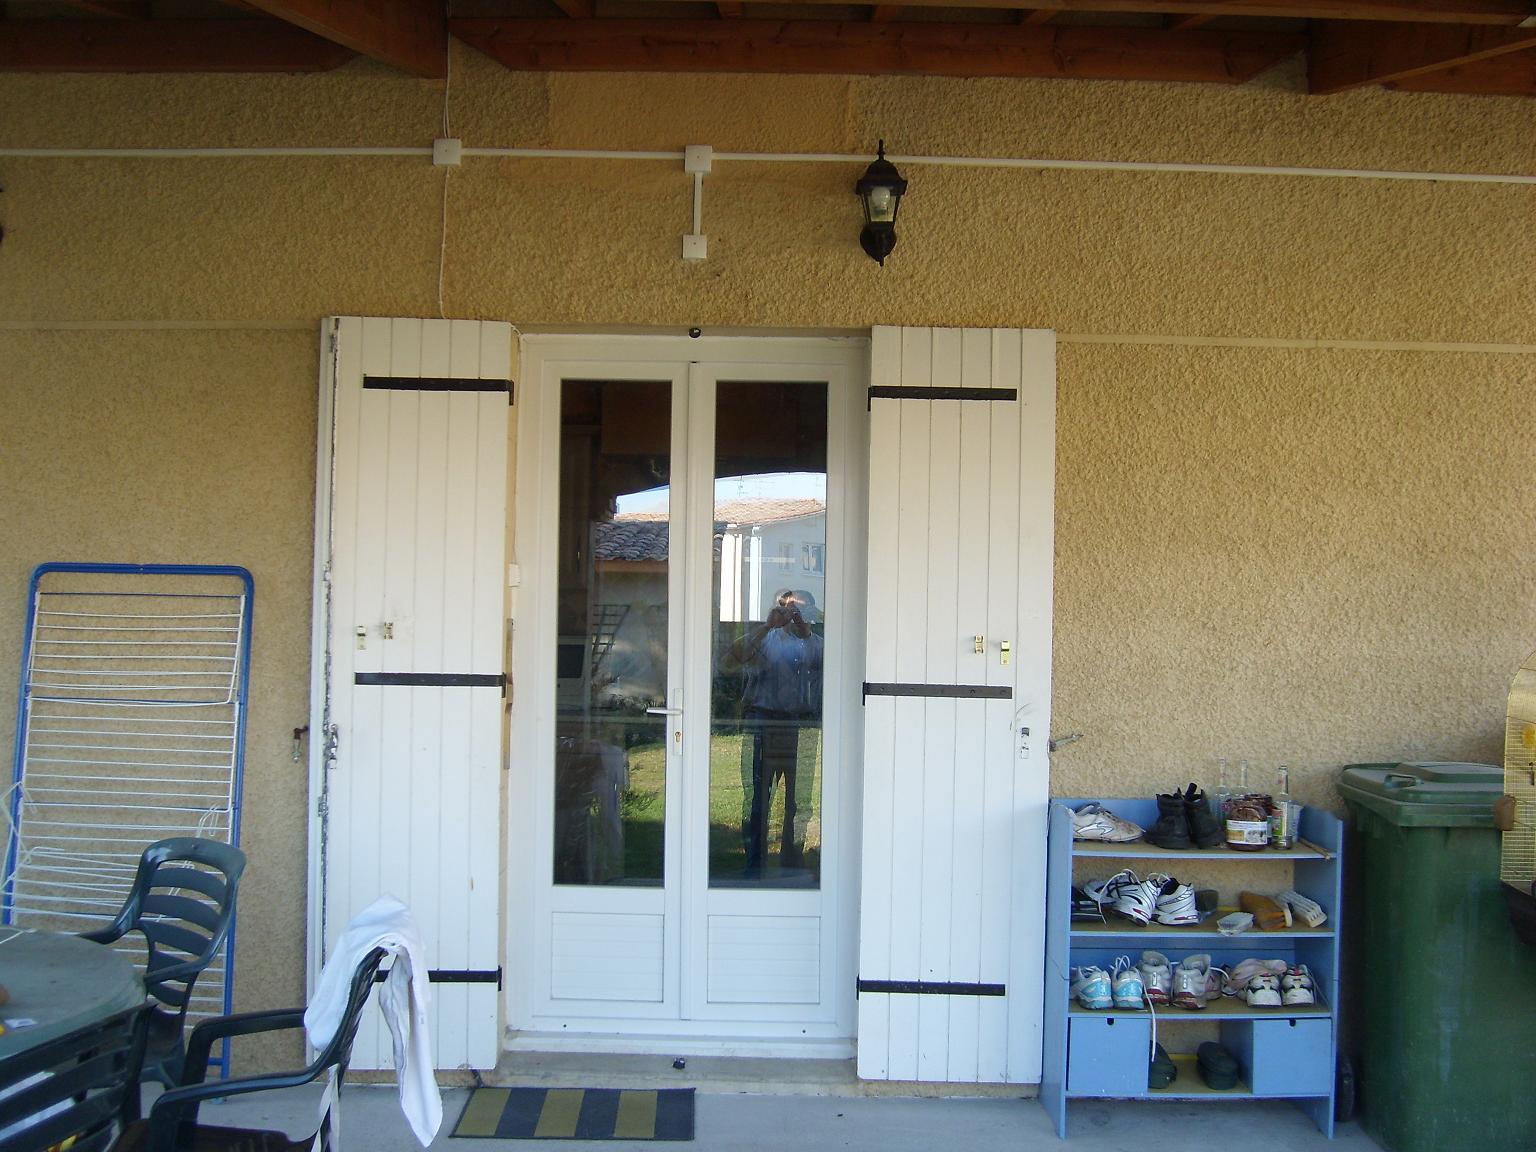 Agrandir Porte Fenêtre En Baie Coulissante Communauté Leroy Merlin